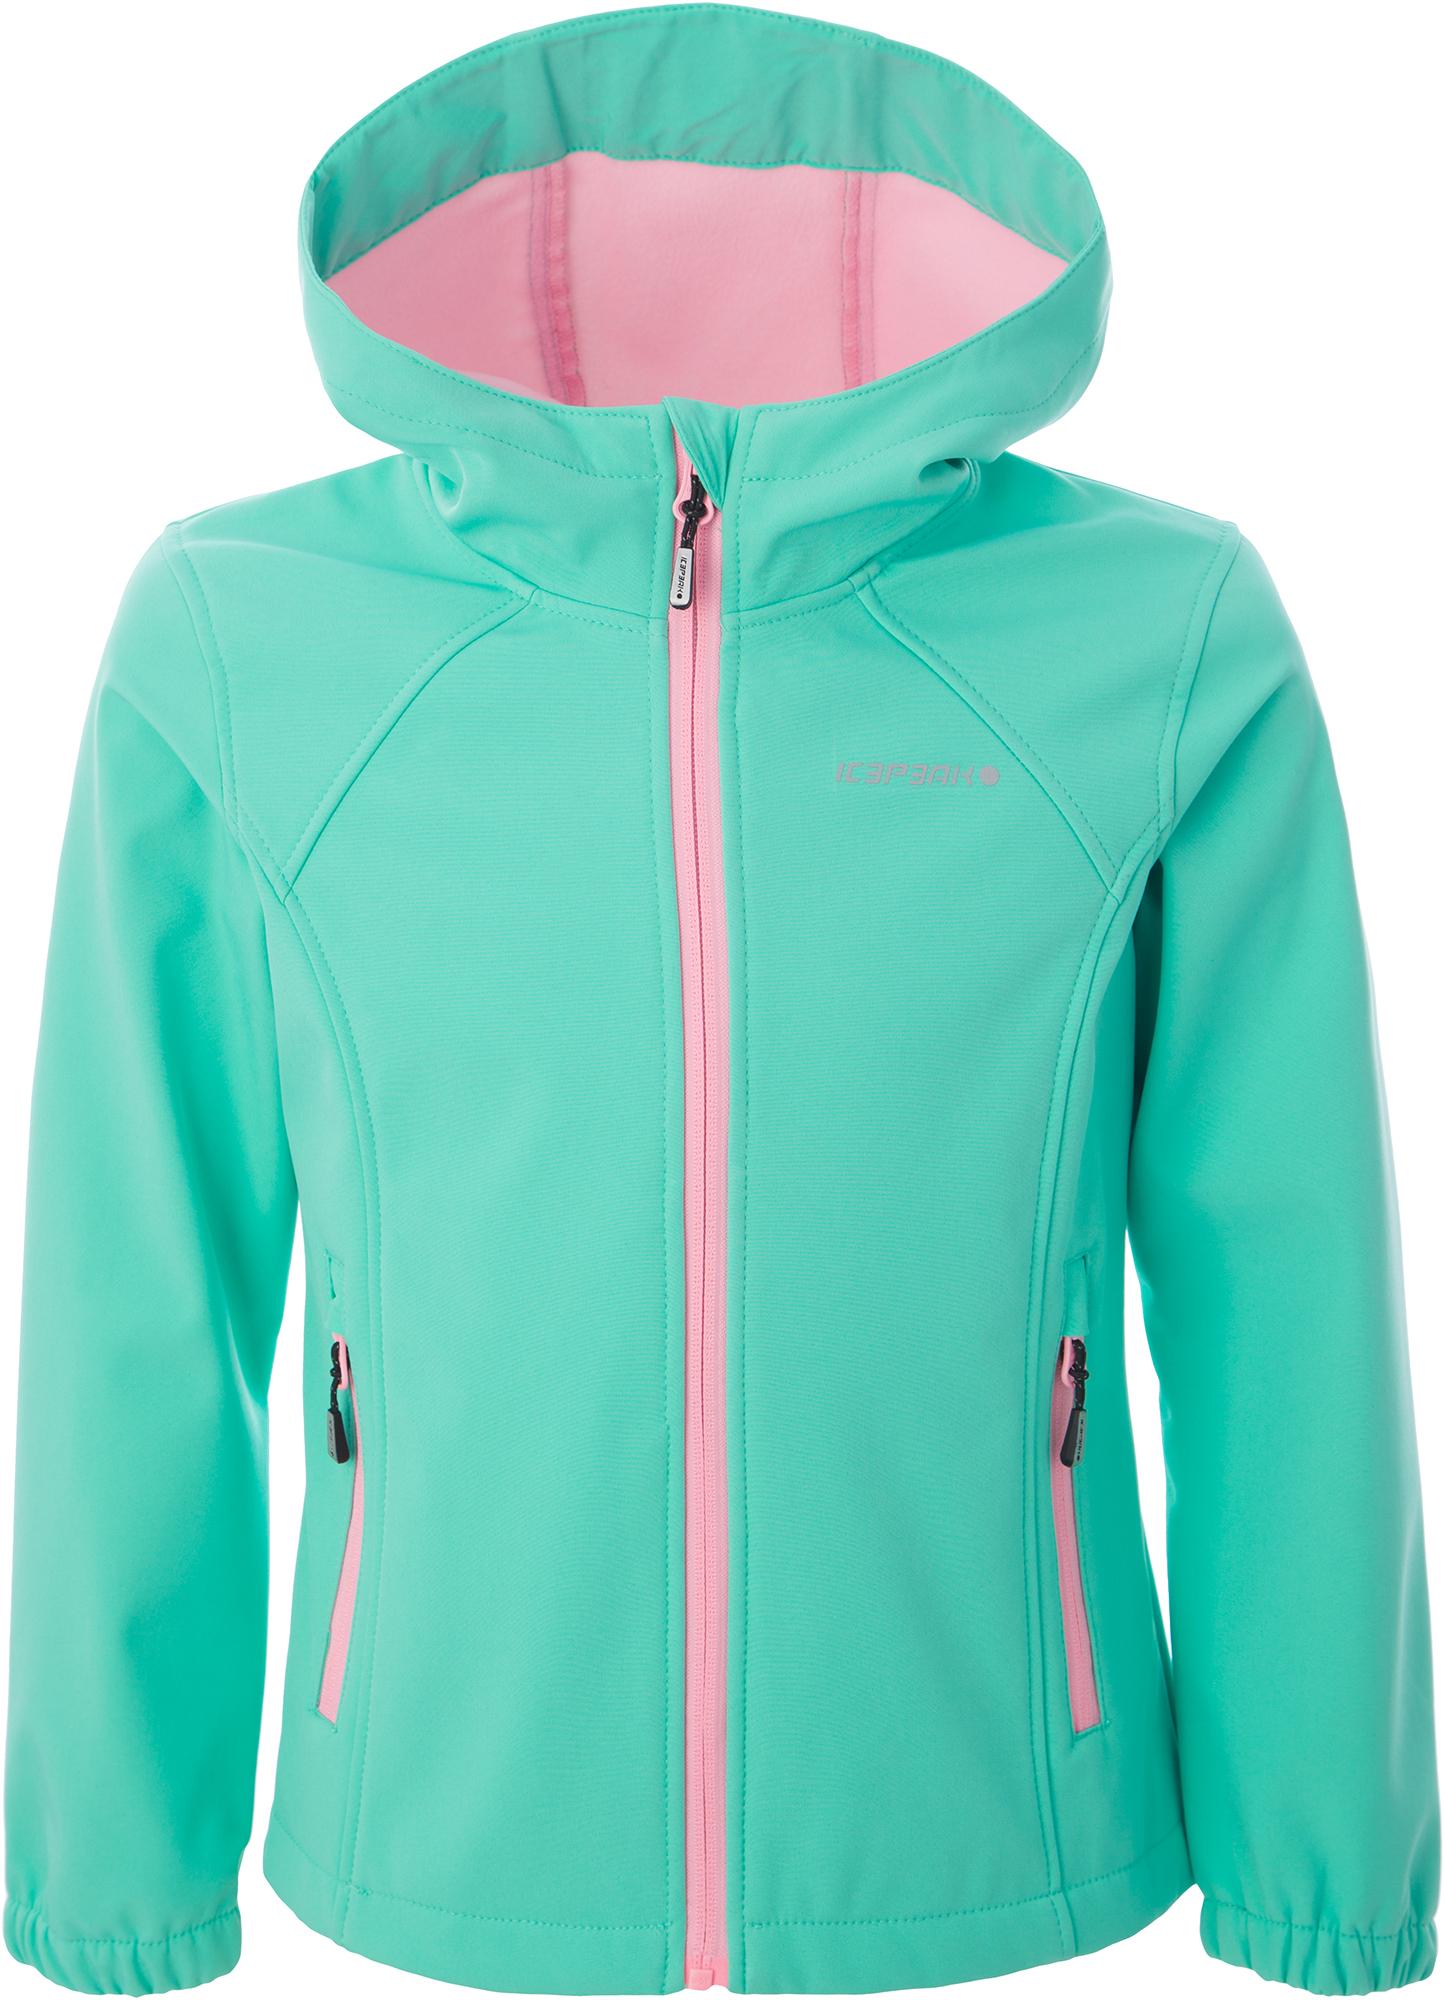 IcePeak Куртка софт-шелл для девочек IcePeak Tuua, размер 164 icepeak шапка для девочек icepeak размер без размера